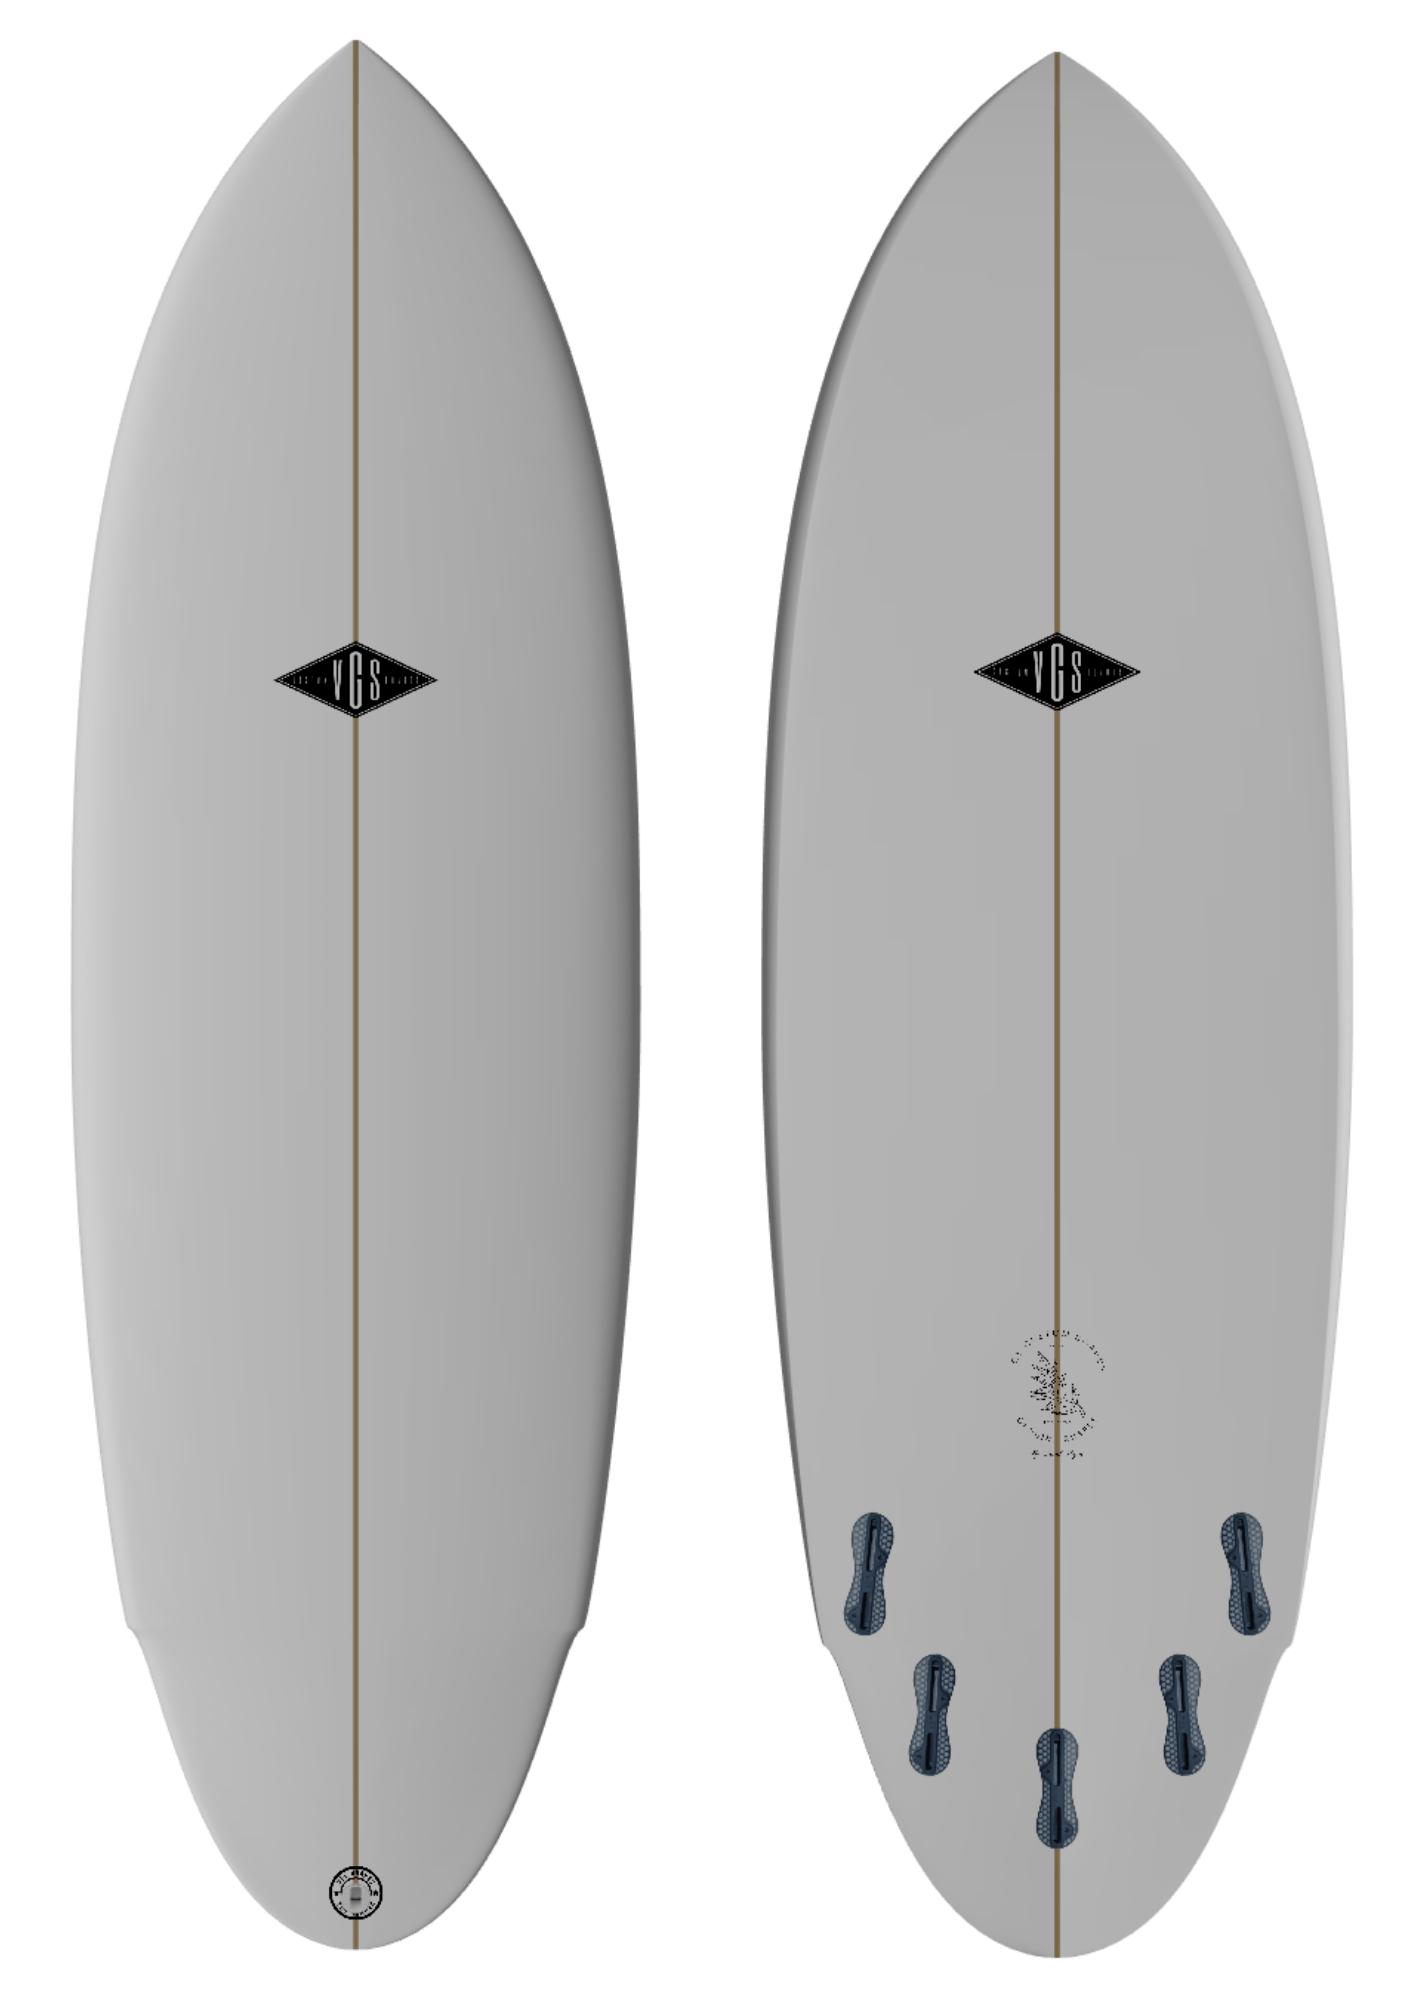 Modelo Bomb | Vgs Custom Boards